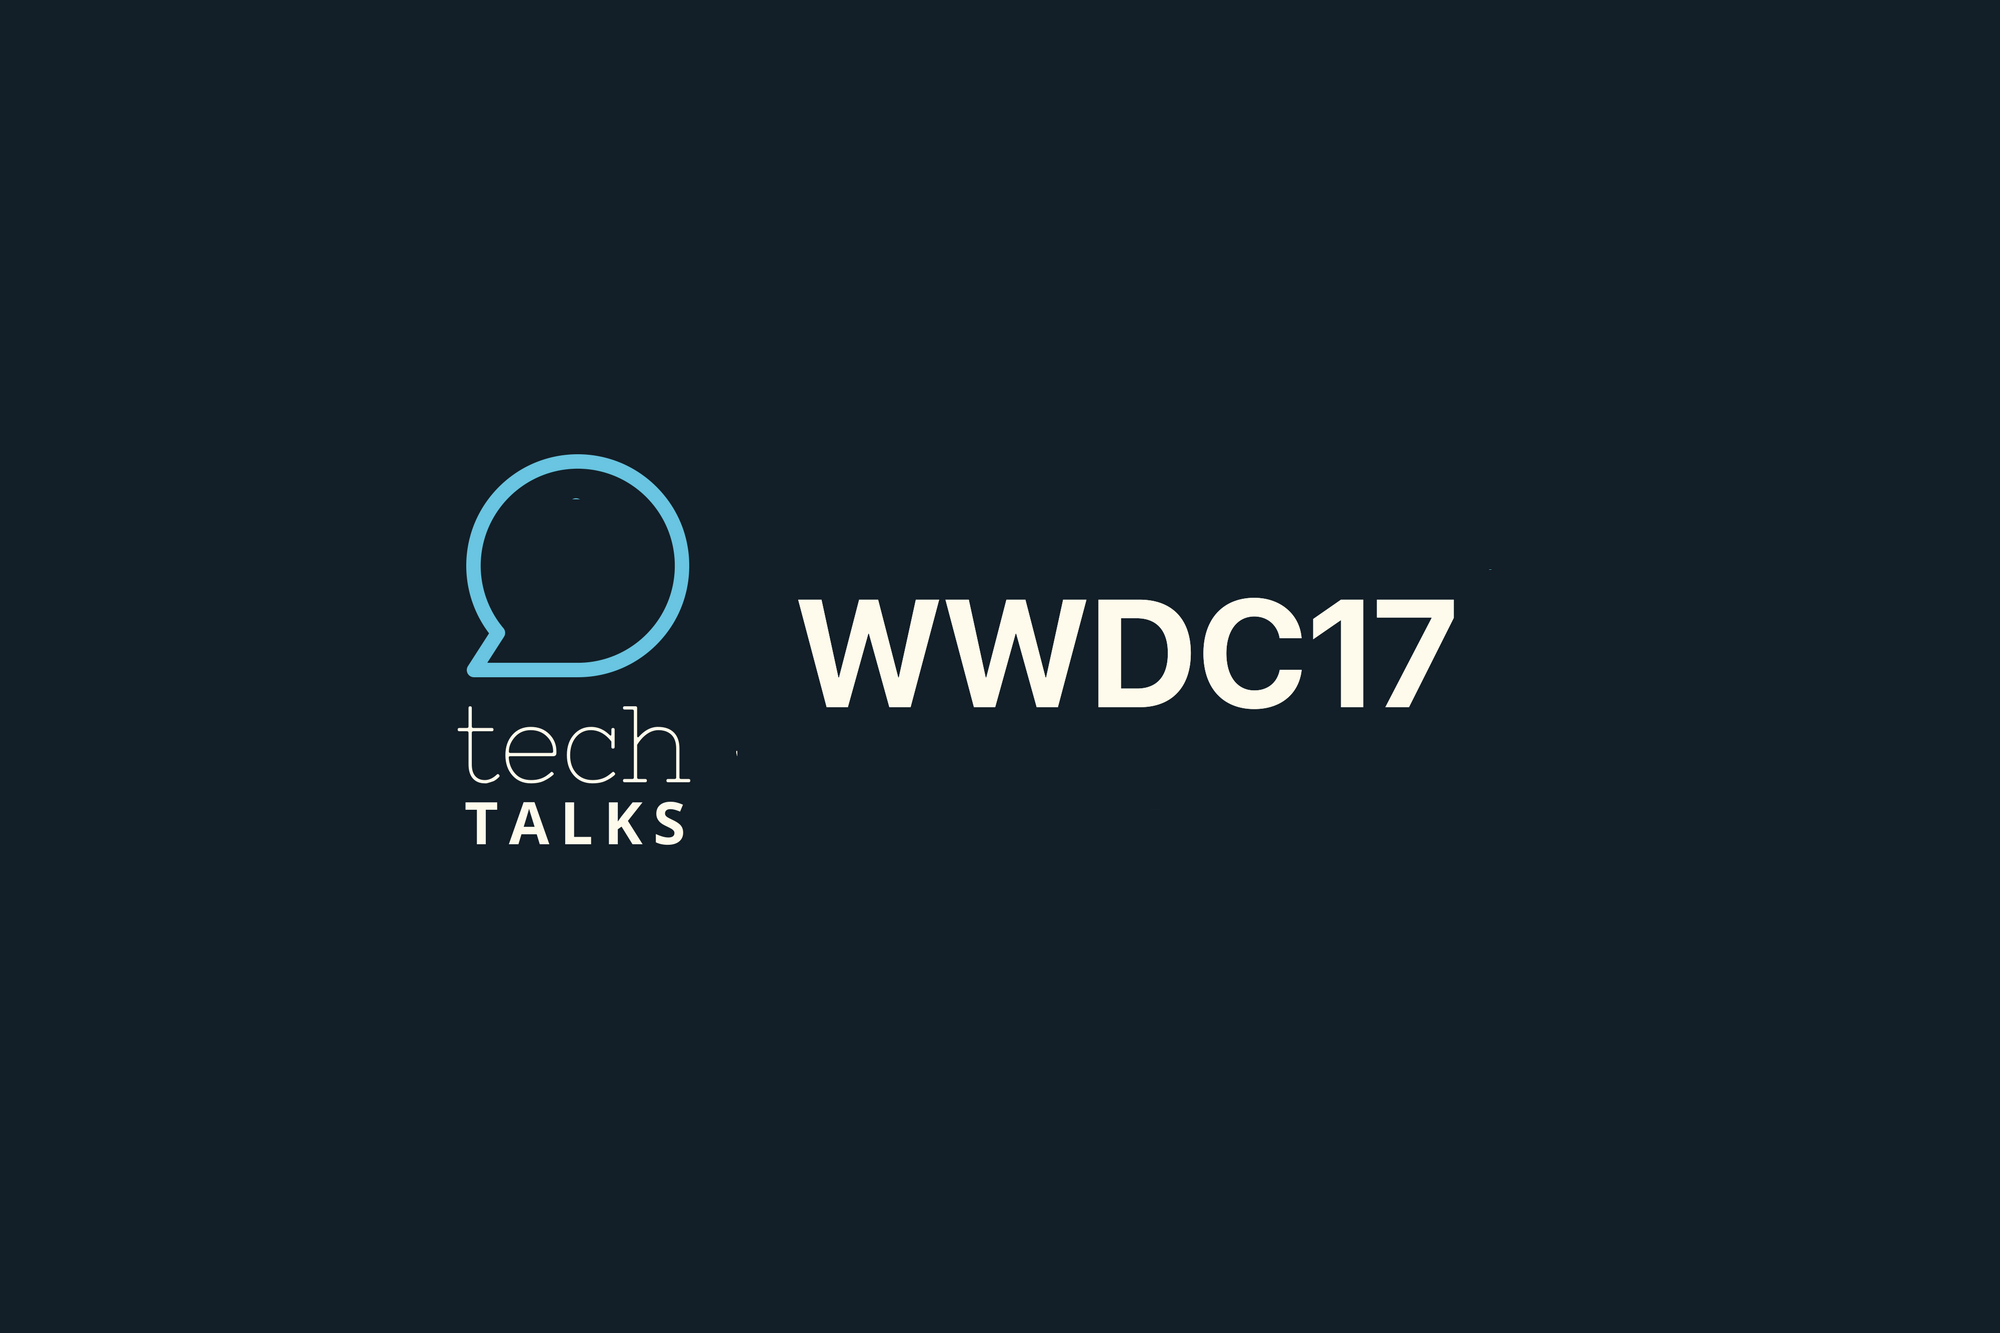 WWDC17 summary